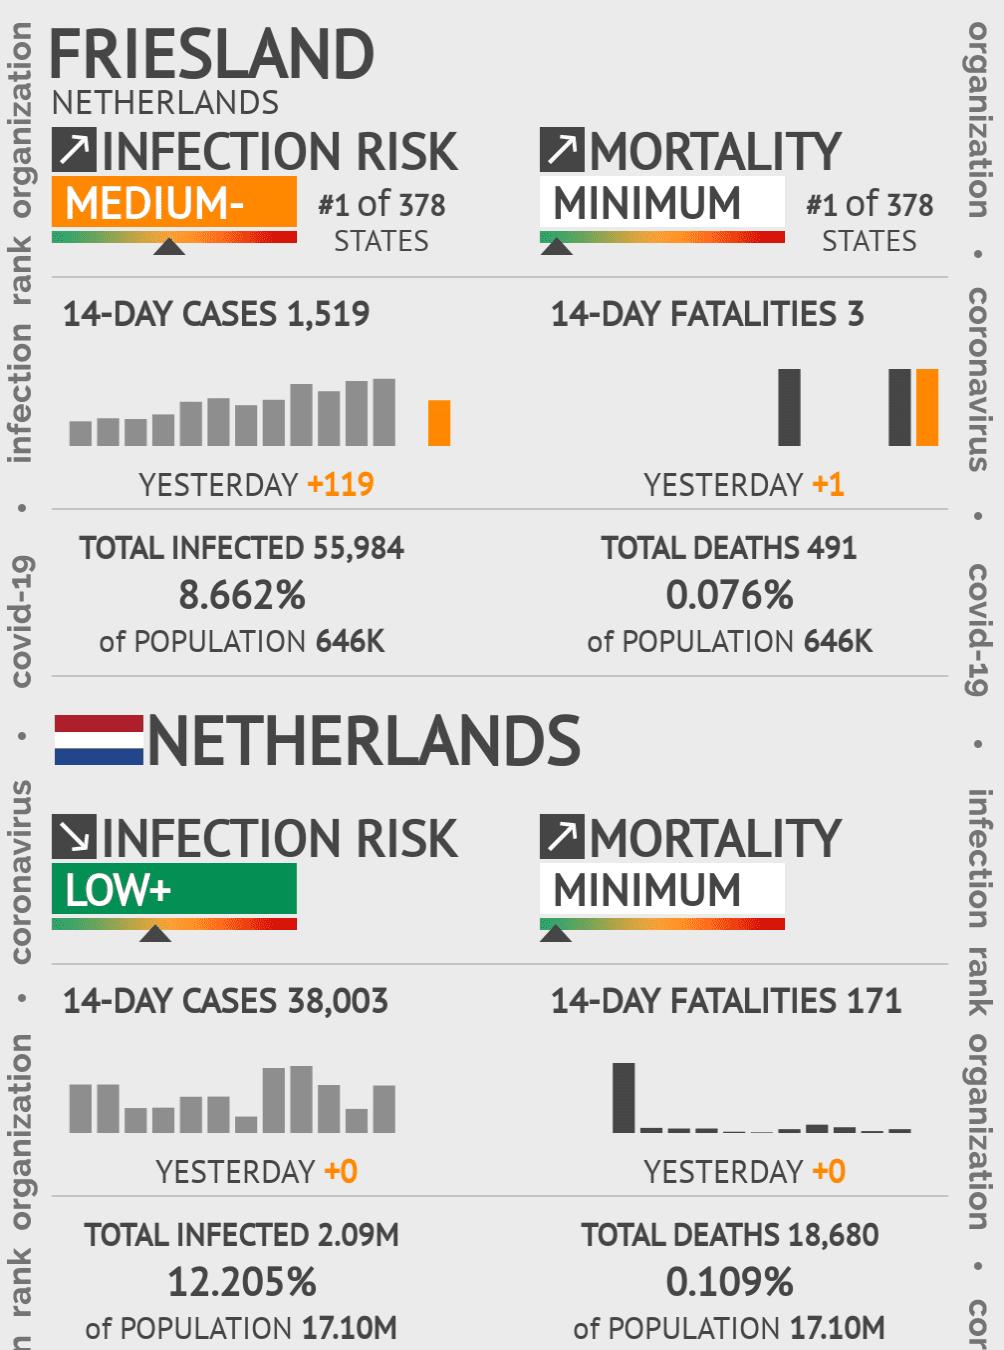 Friesland Coronavirus Covid-19 Risk of Infection on February 25, 2021